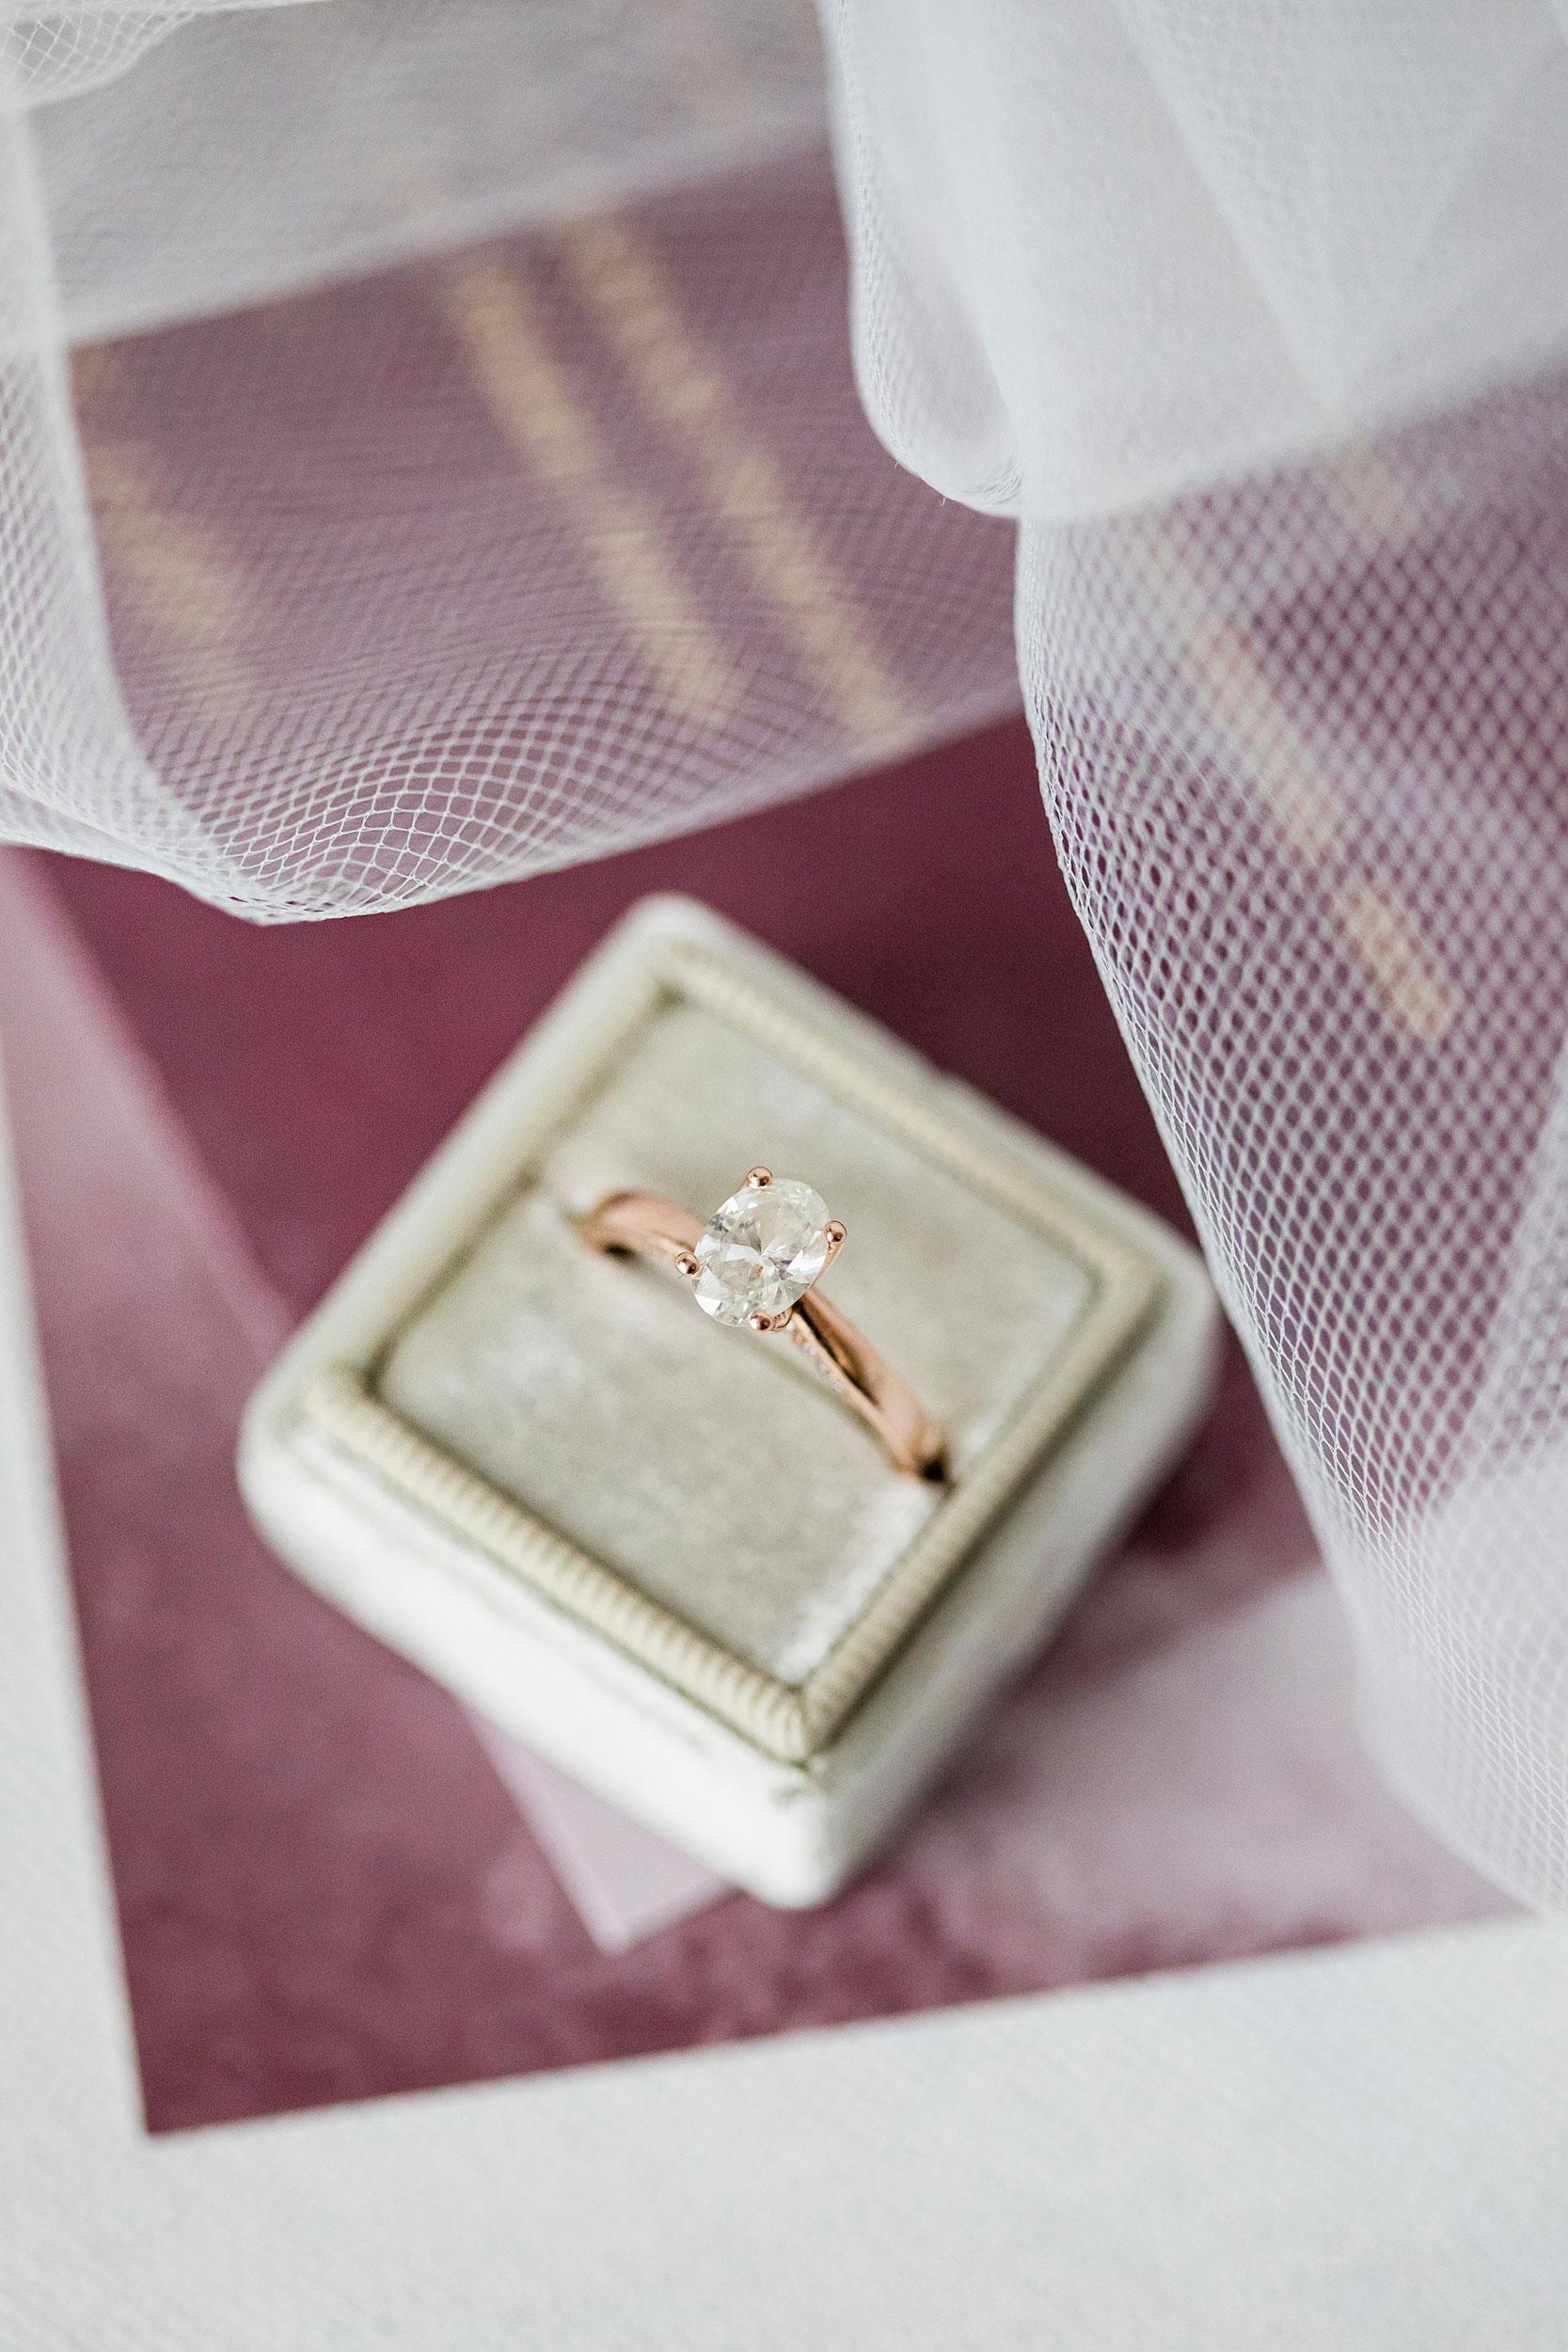 stylish-wedding-photography-windsor-toronto-ontario-wedding-photographer-augustus-27-caesars-eryn-shea-photography-34.JPG